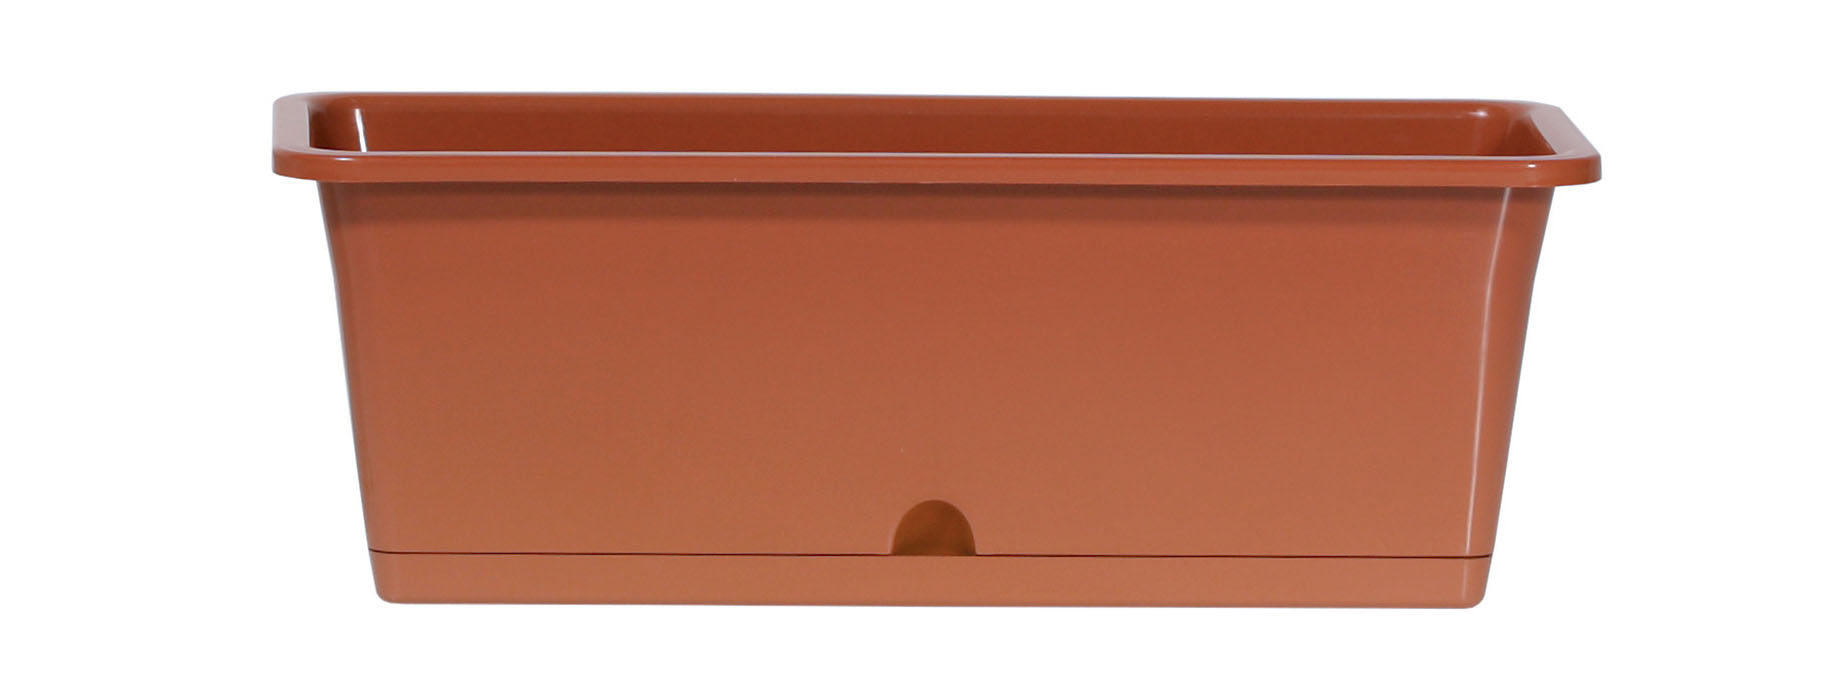 PROSPERPLAST Truhlík CAMELIA terakota 50,8cm